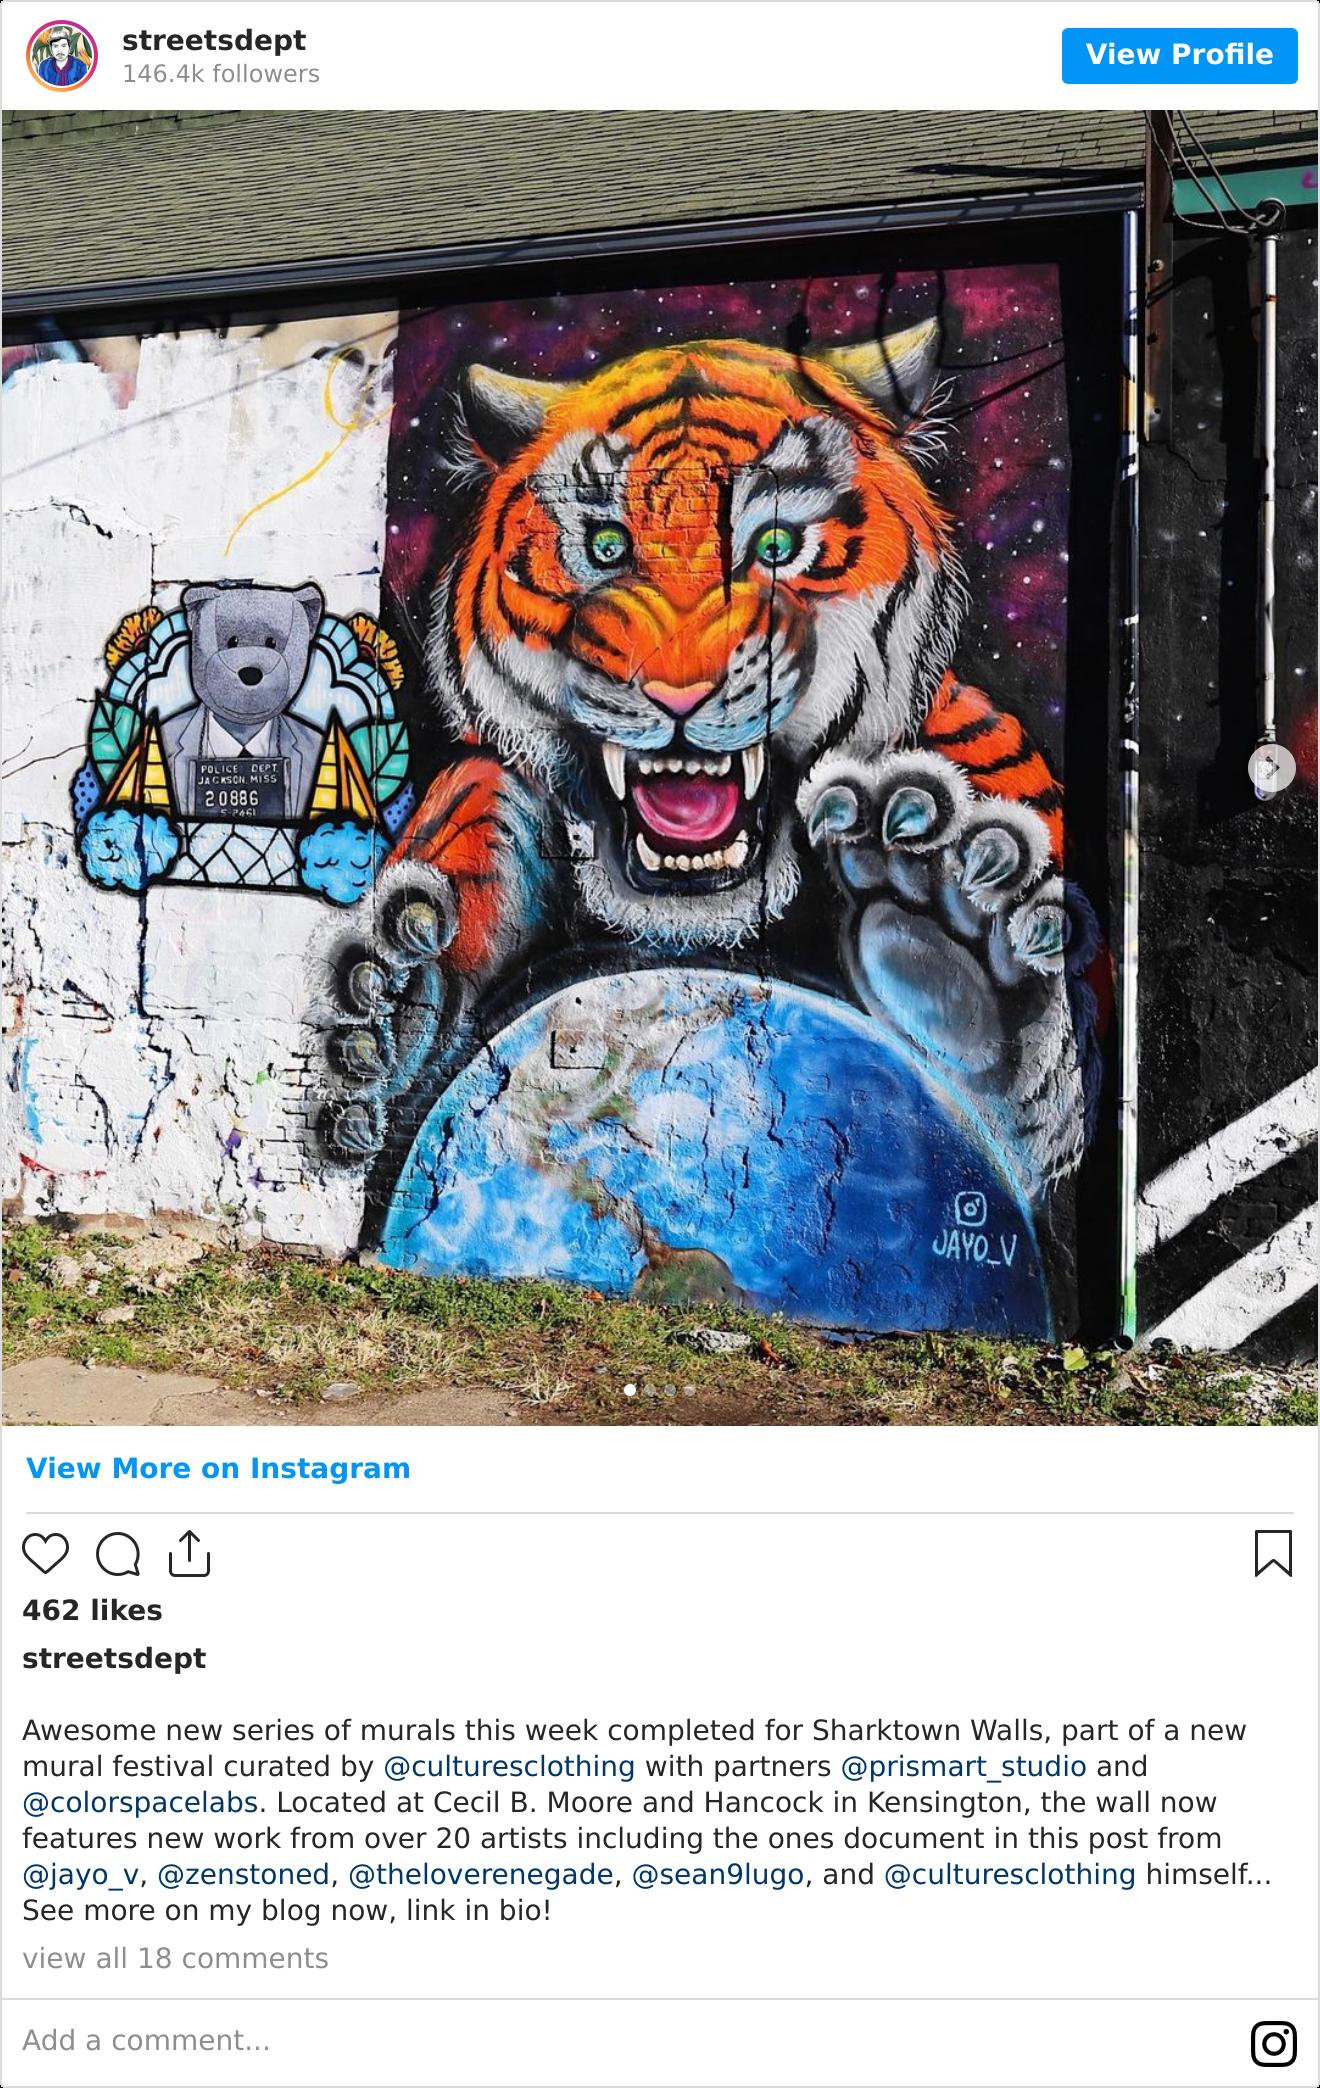 https://www.instagram.com/p/CH0y3lTgISX/